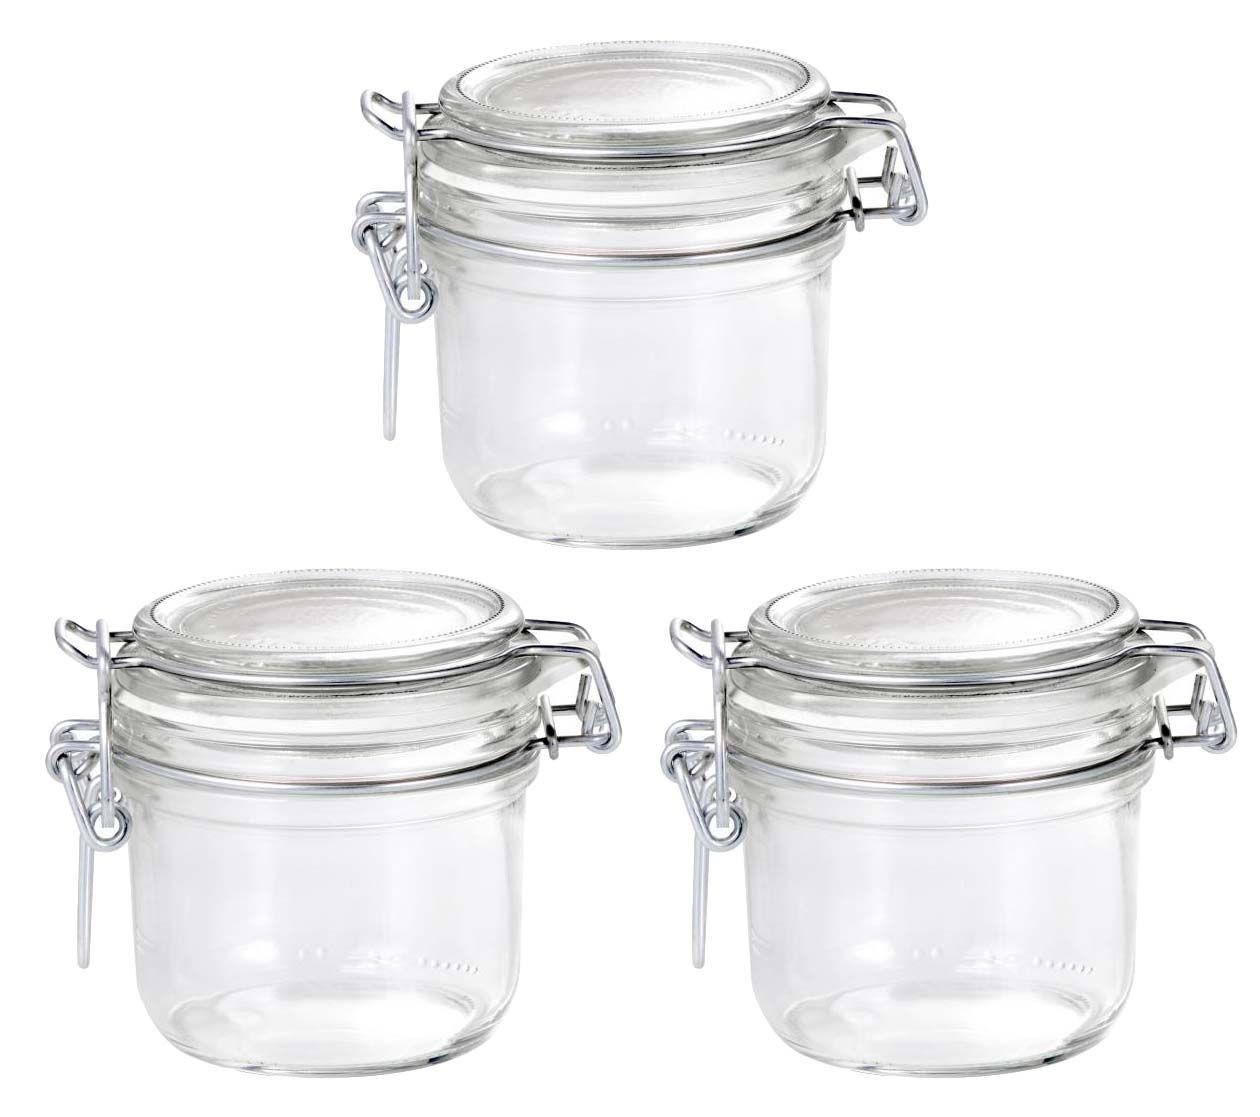 Conj 3 Pote de vidro hermético Fido Terrina 200 ml Ø 83 mm